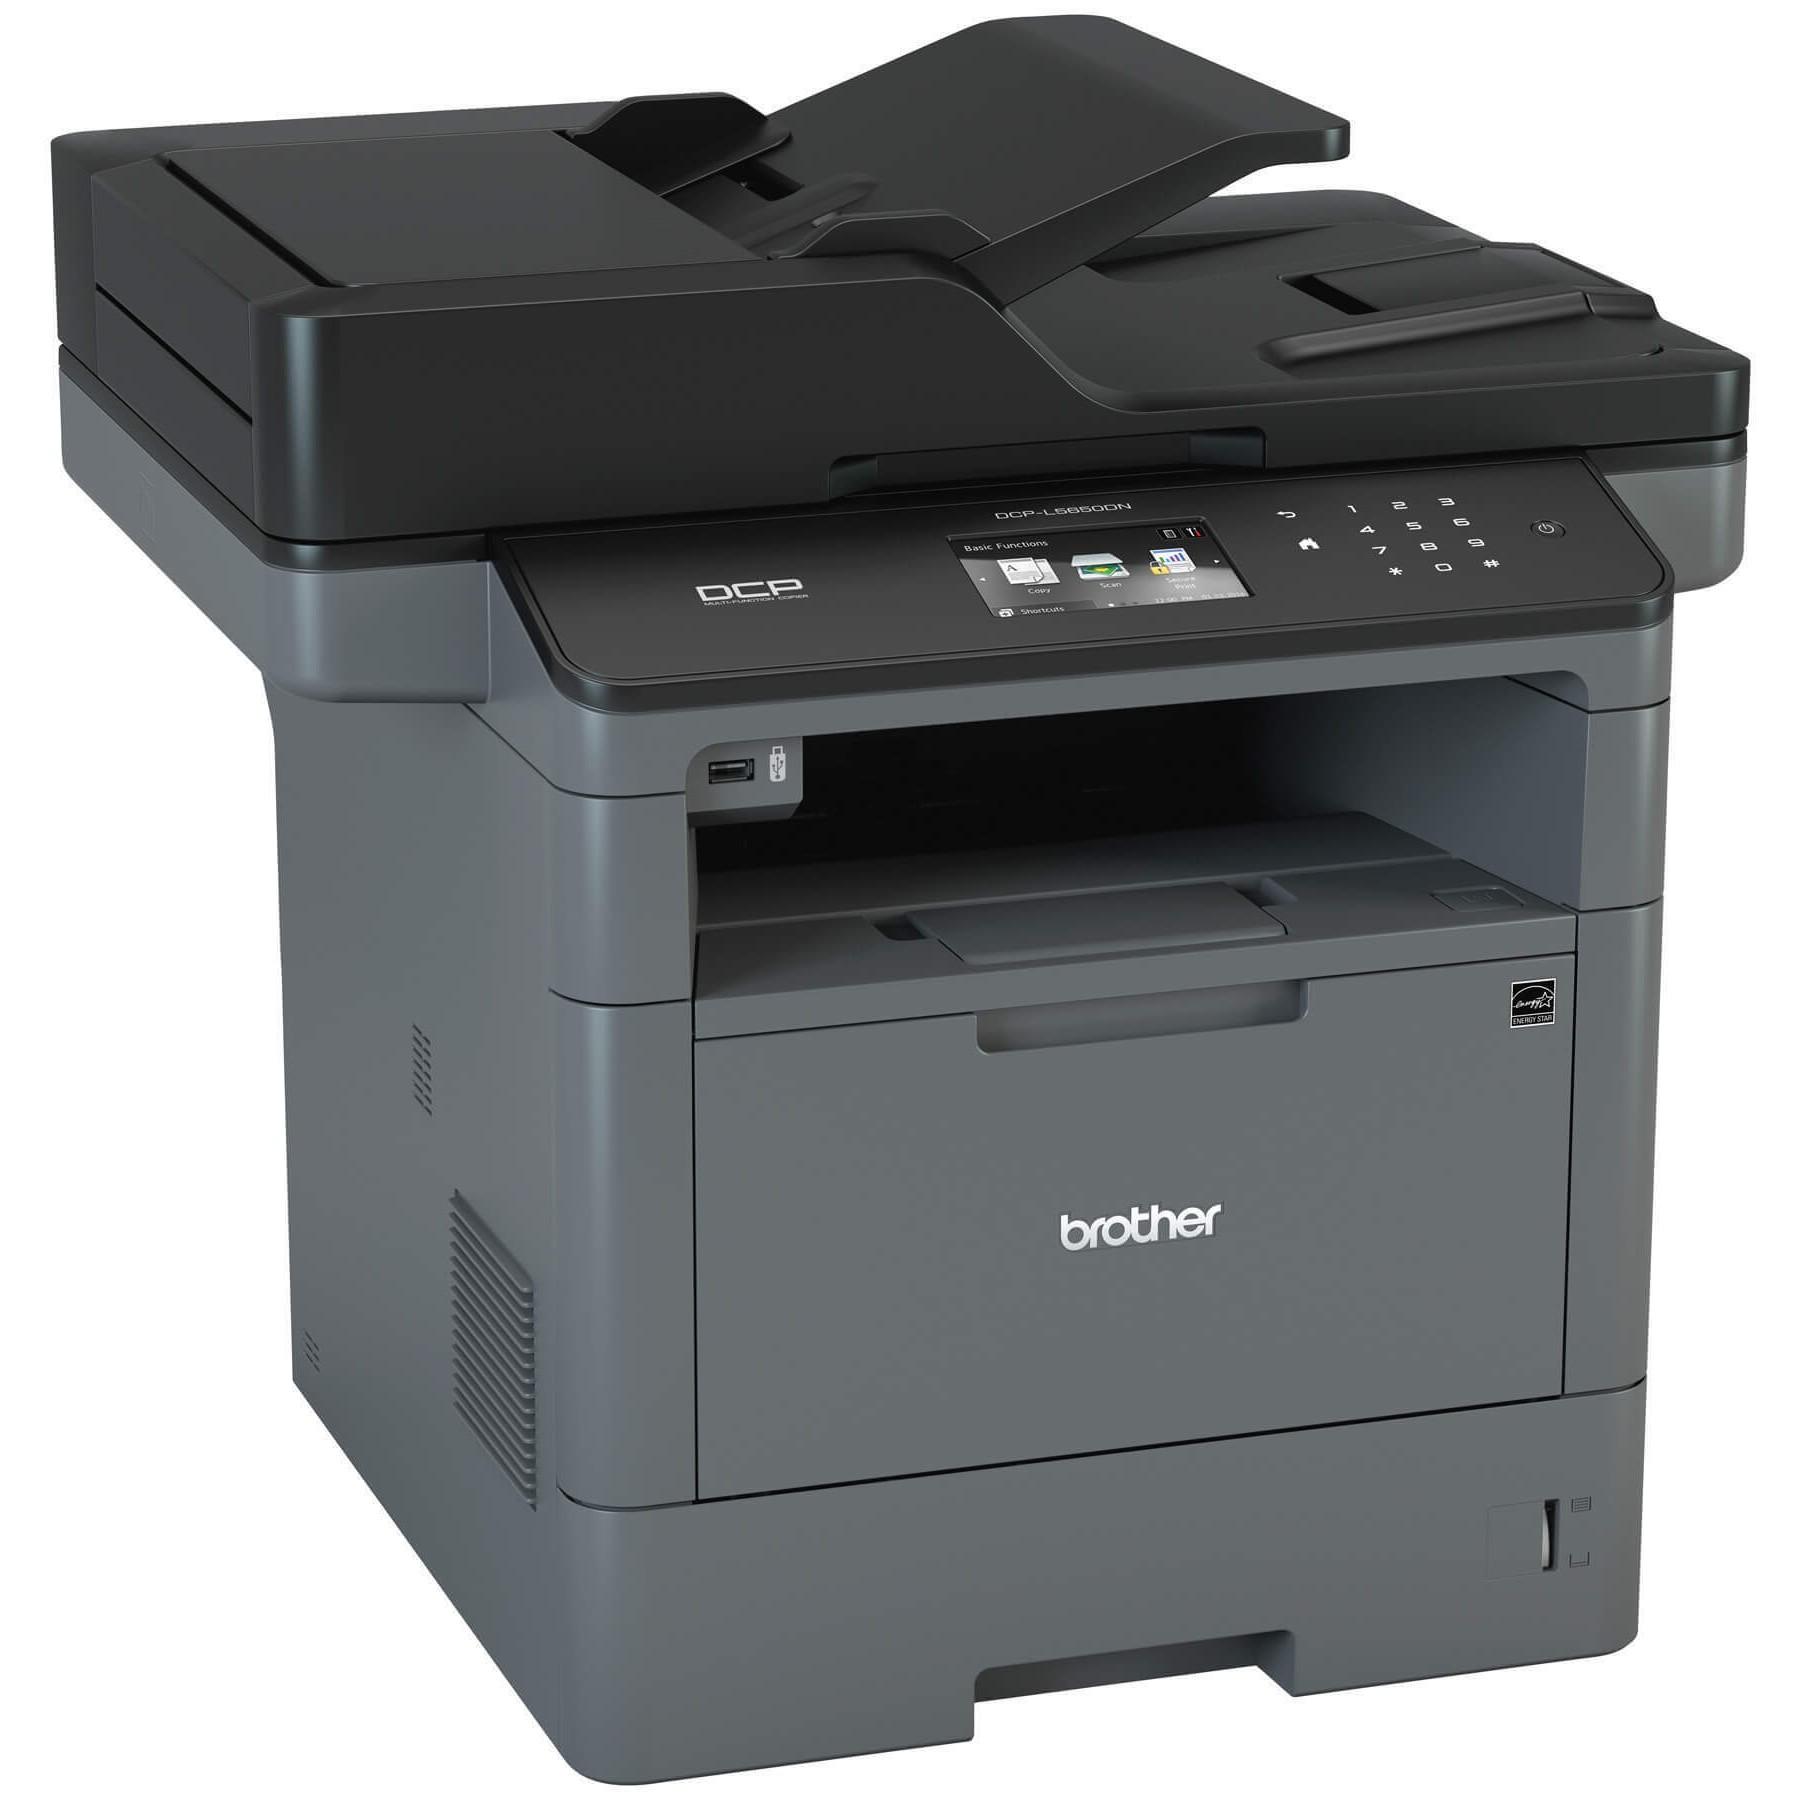 Impressora Multifuncional Brother 5652 Dcp L5652dn Laser